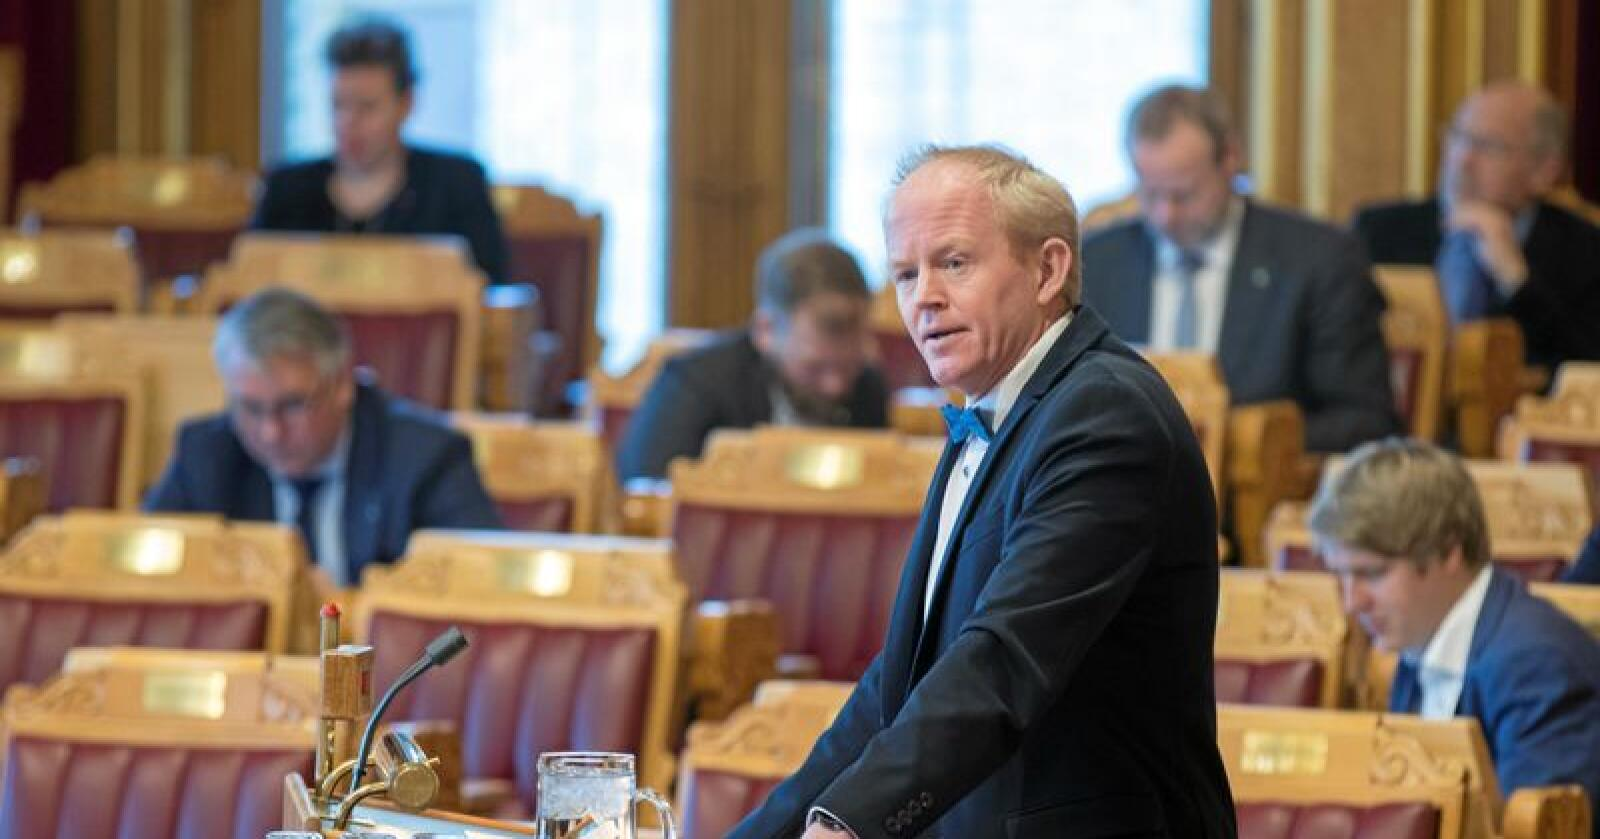 Lars Haltbrekken (SV) er glad for EU-initiativet mot mikroplast. Foto: Vidar Ruud / NTB scanpix